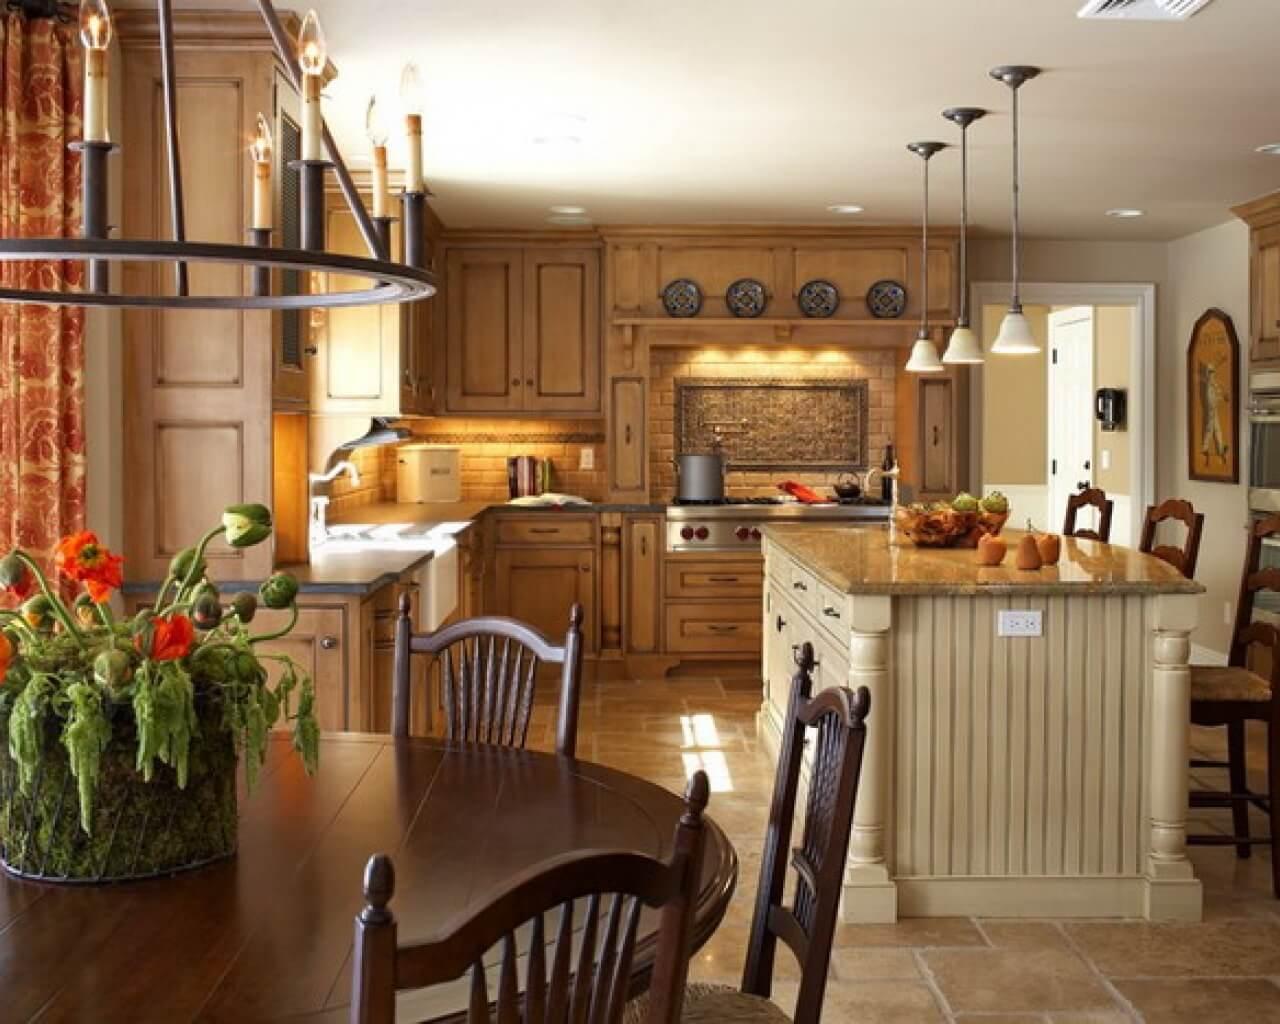 country-kitchen-decor-Coolest-99DA (1)